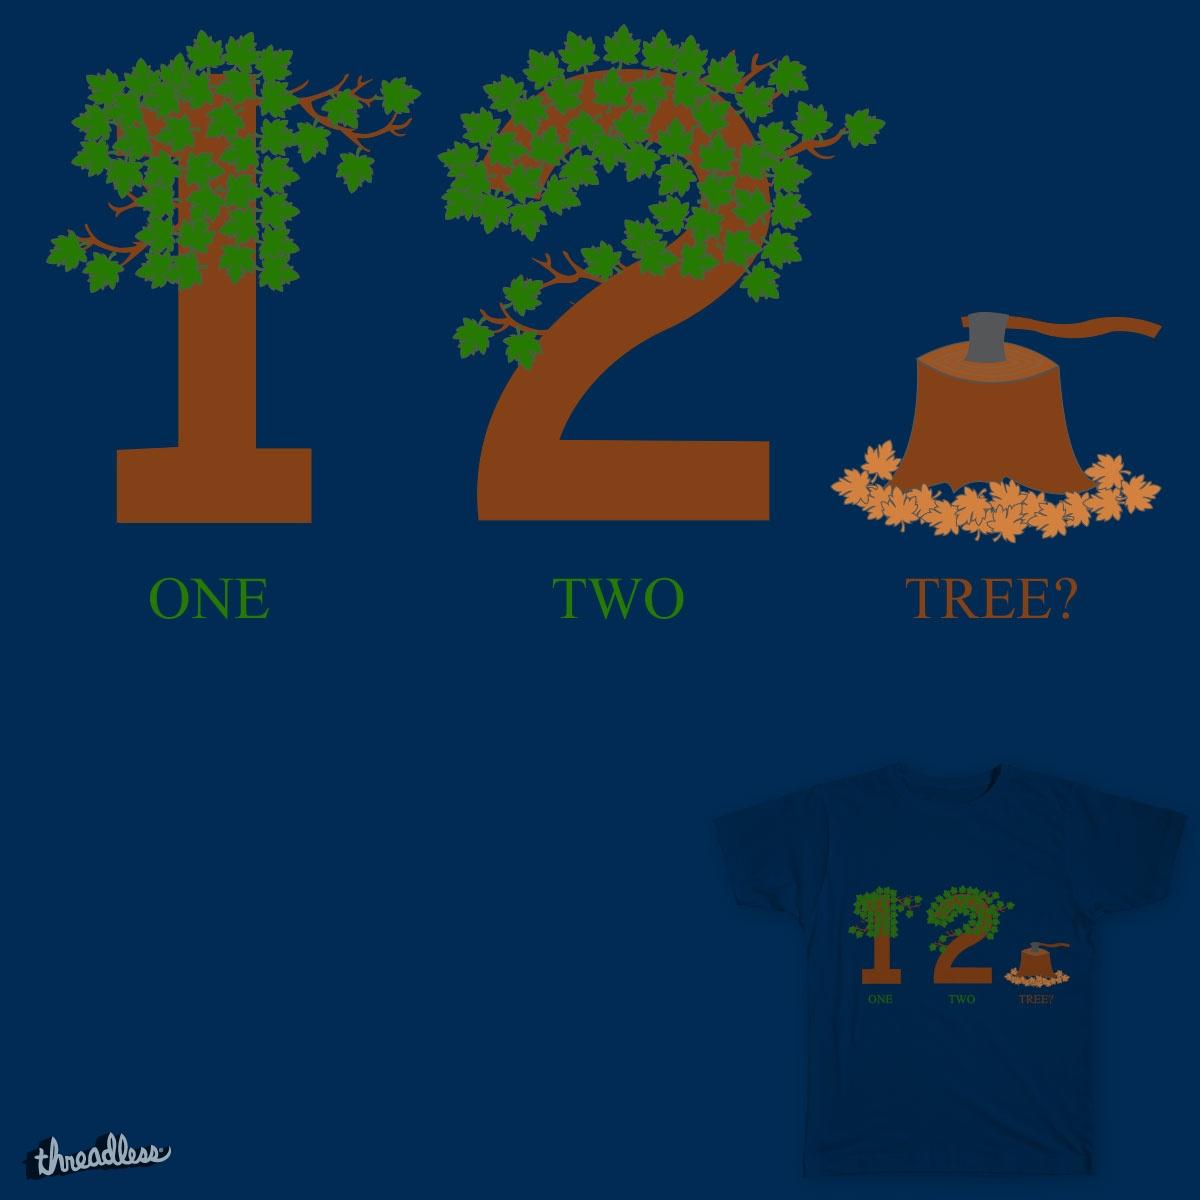 1 2 Tree by dpmcnally15 on Threadless